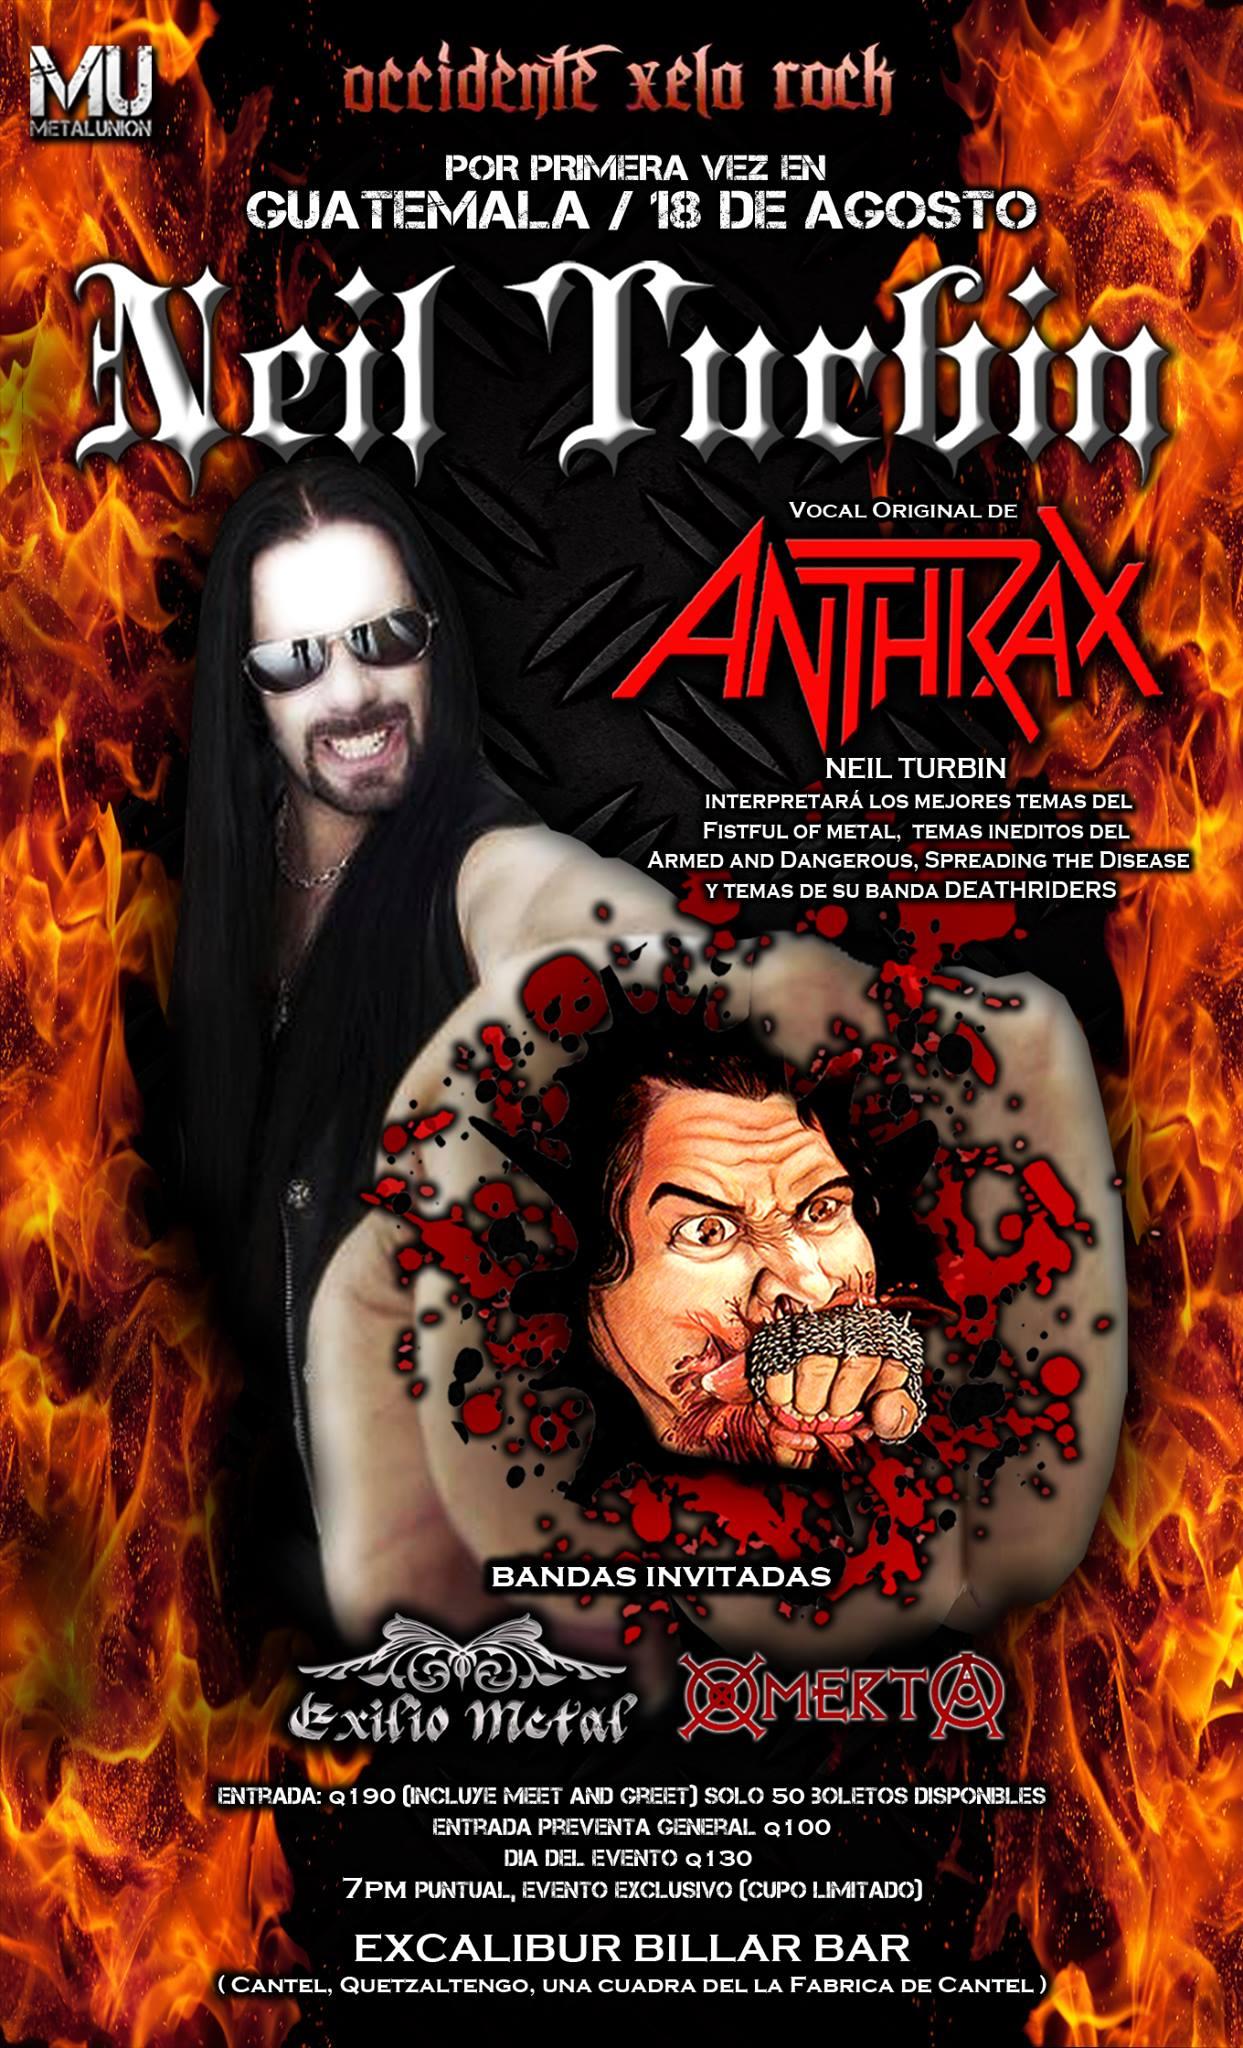 Neil Turbin The Metal Beast Is Back Tour Latin America 2016 Quetzaltengo, Guatemala 8/18/2016